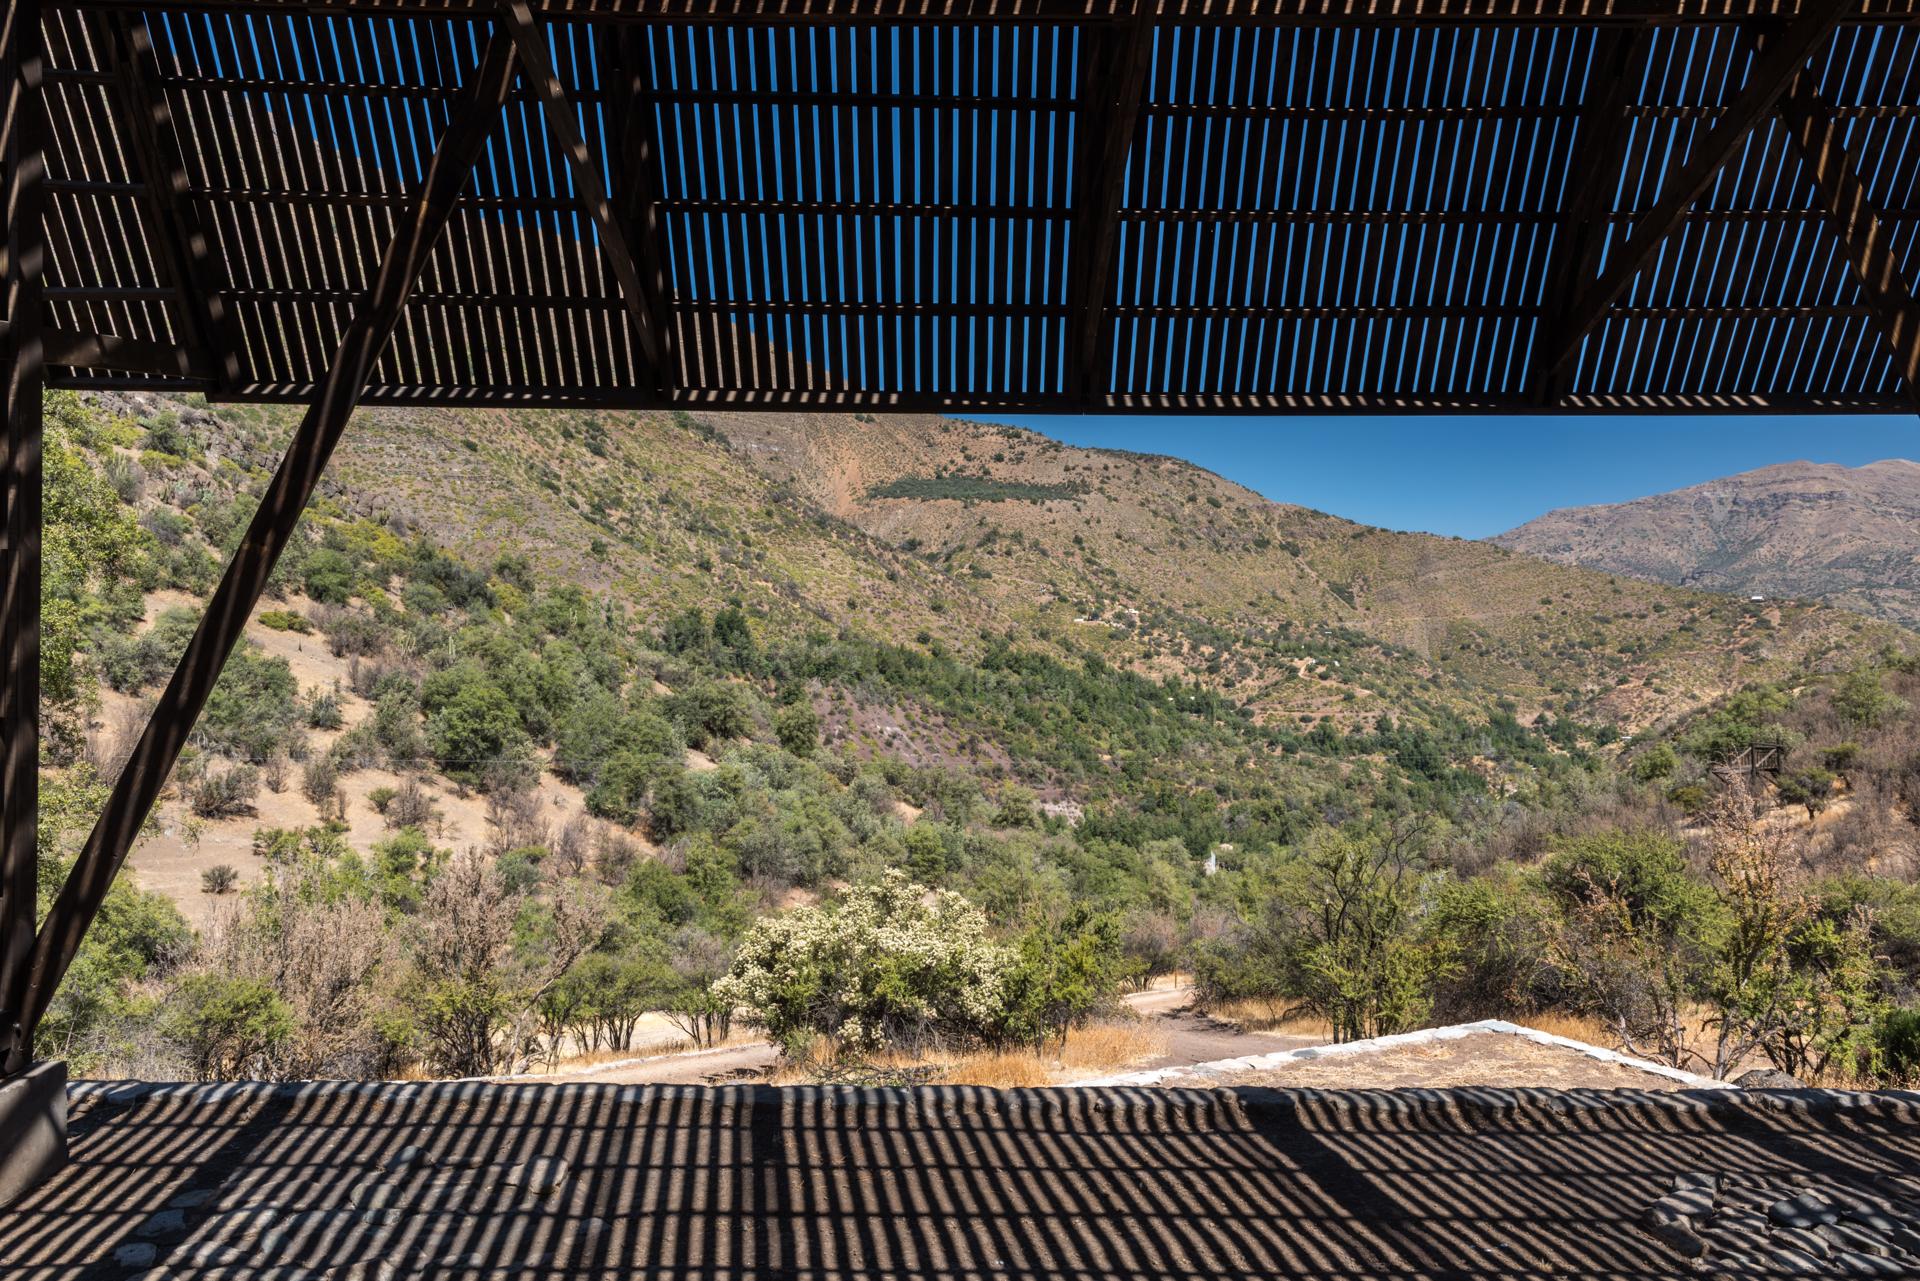 ELTON LENIZ Shadow Pavilion © Gonzalo Puga-4894